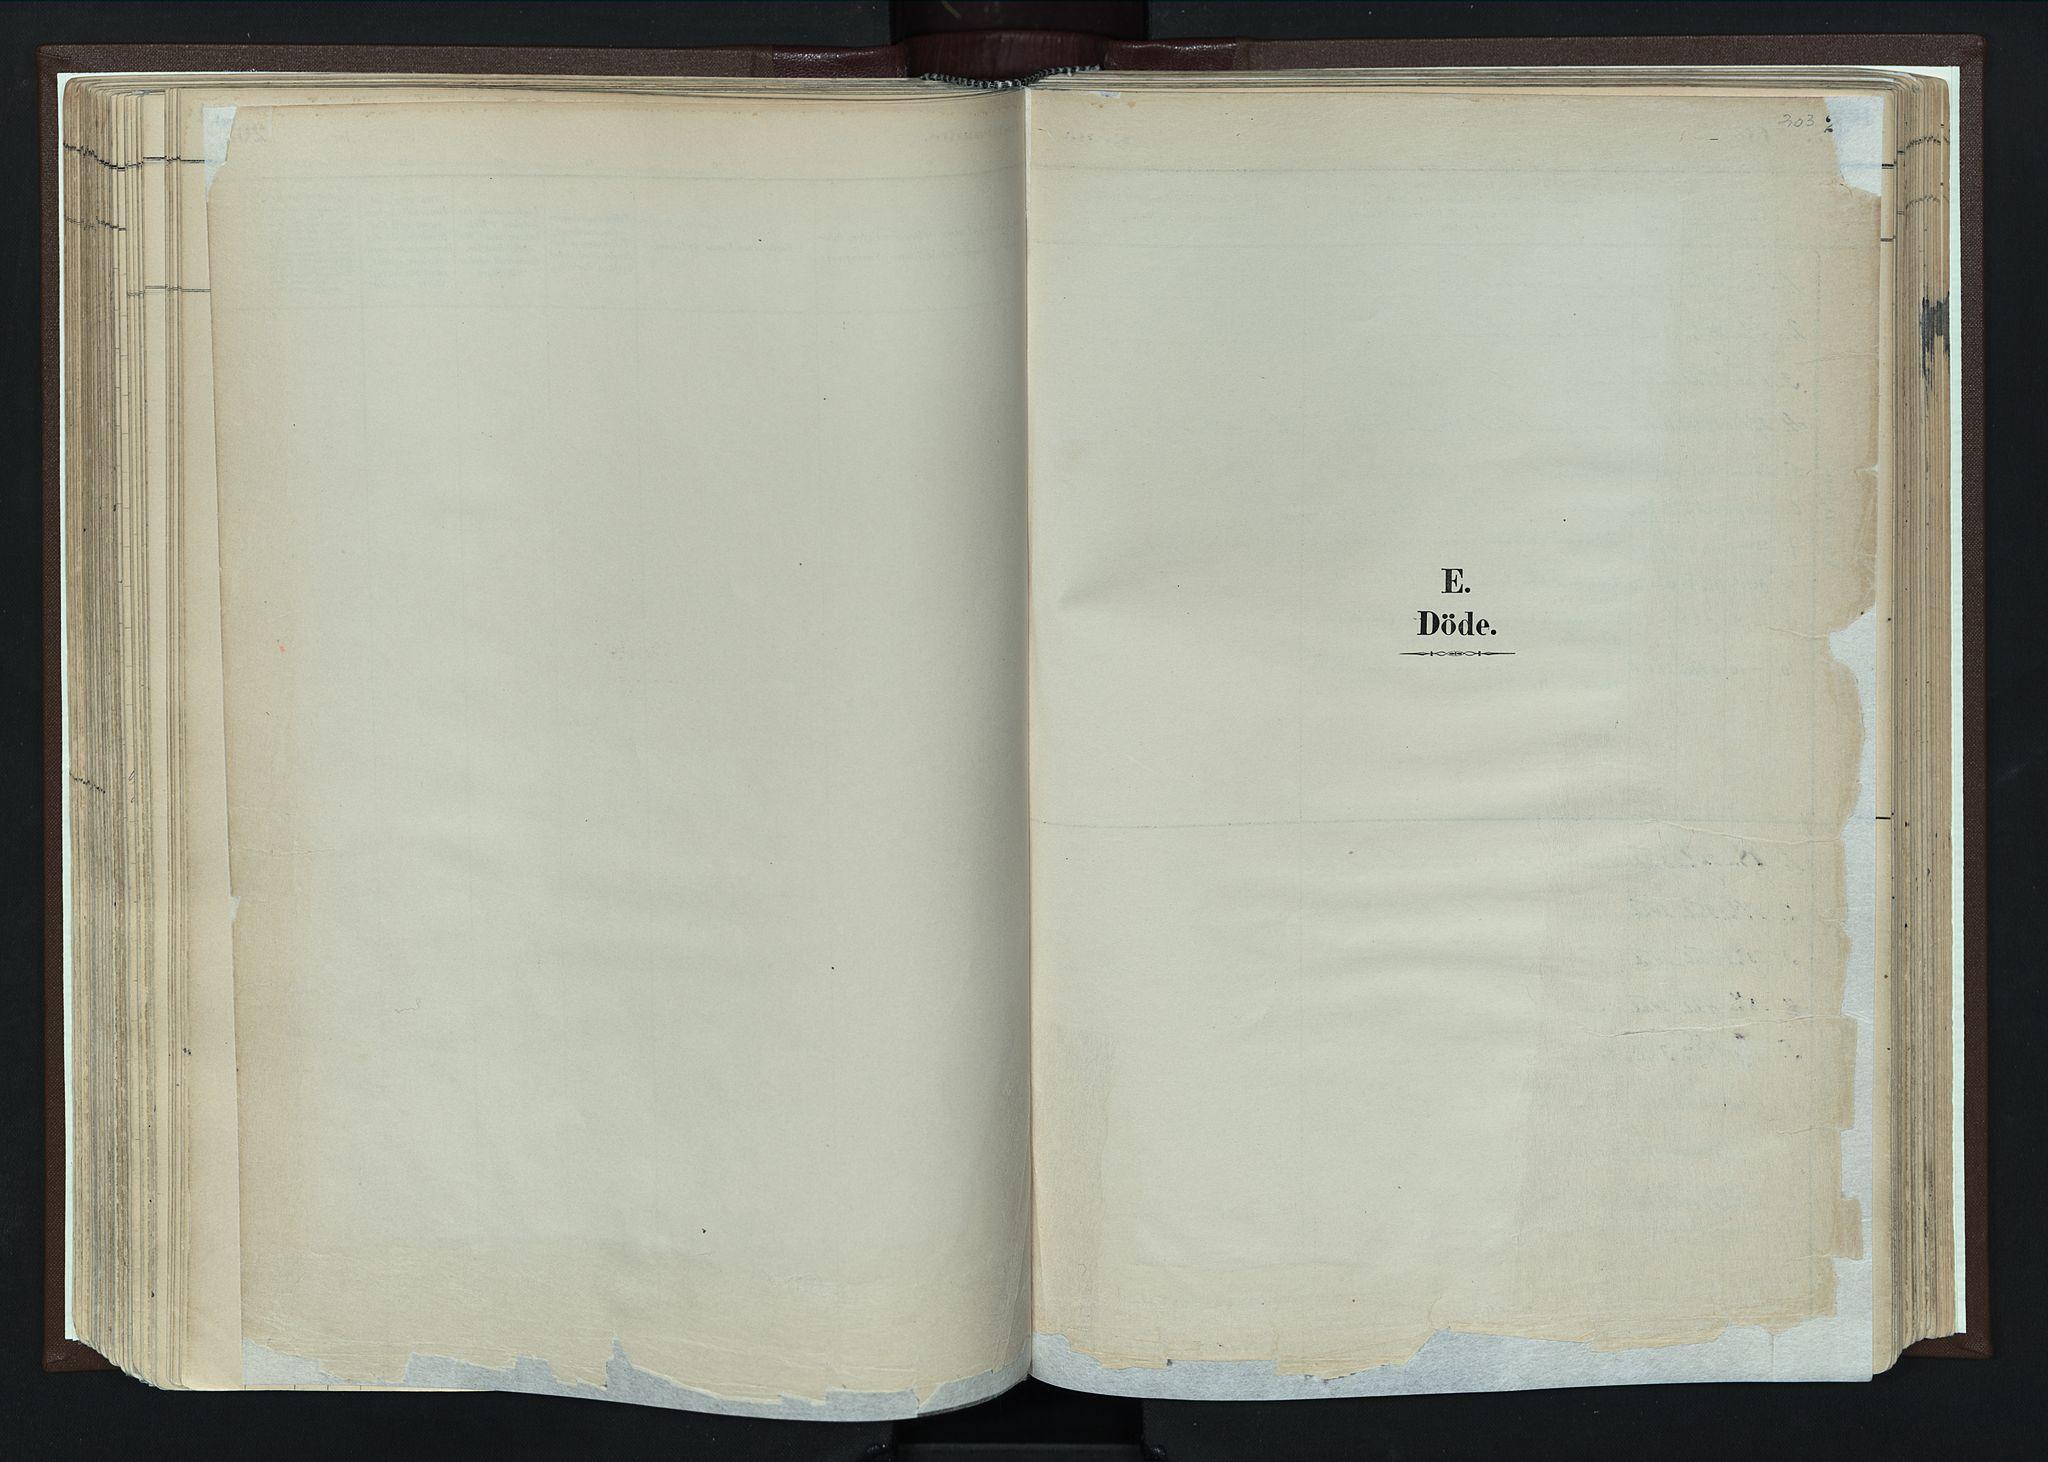 SAH, Nord-Fron prestekontor, Ministerialbok nr. 4, 1884-1914, s. 203